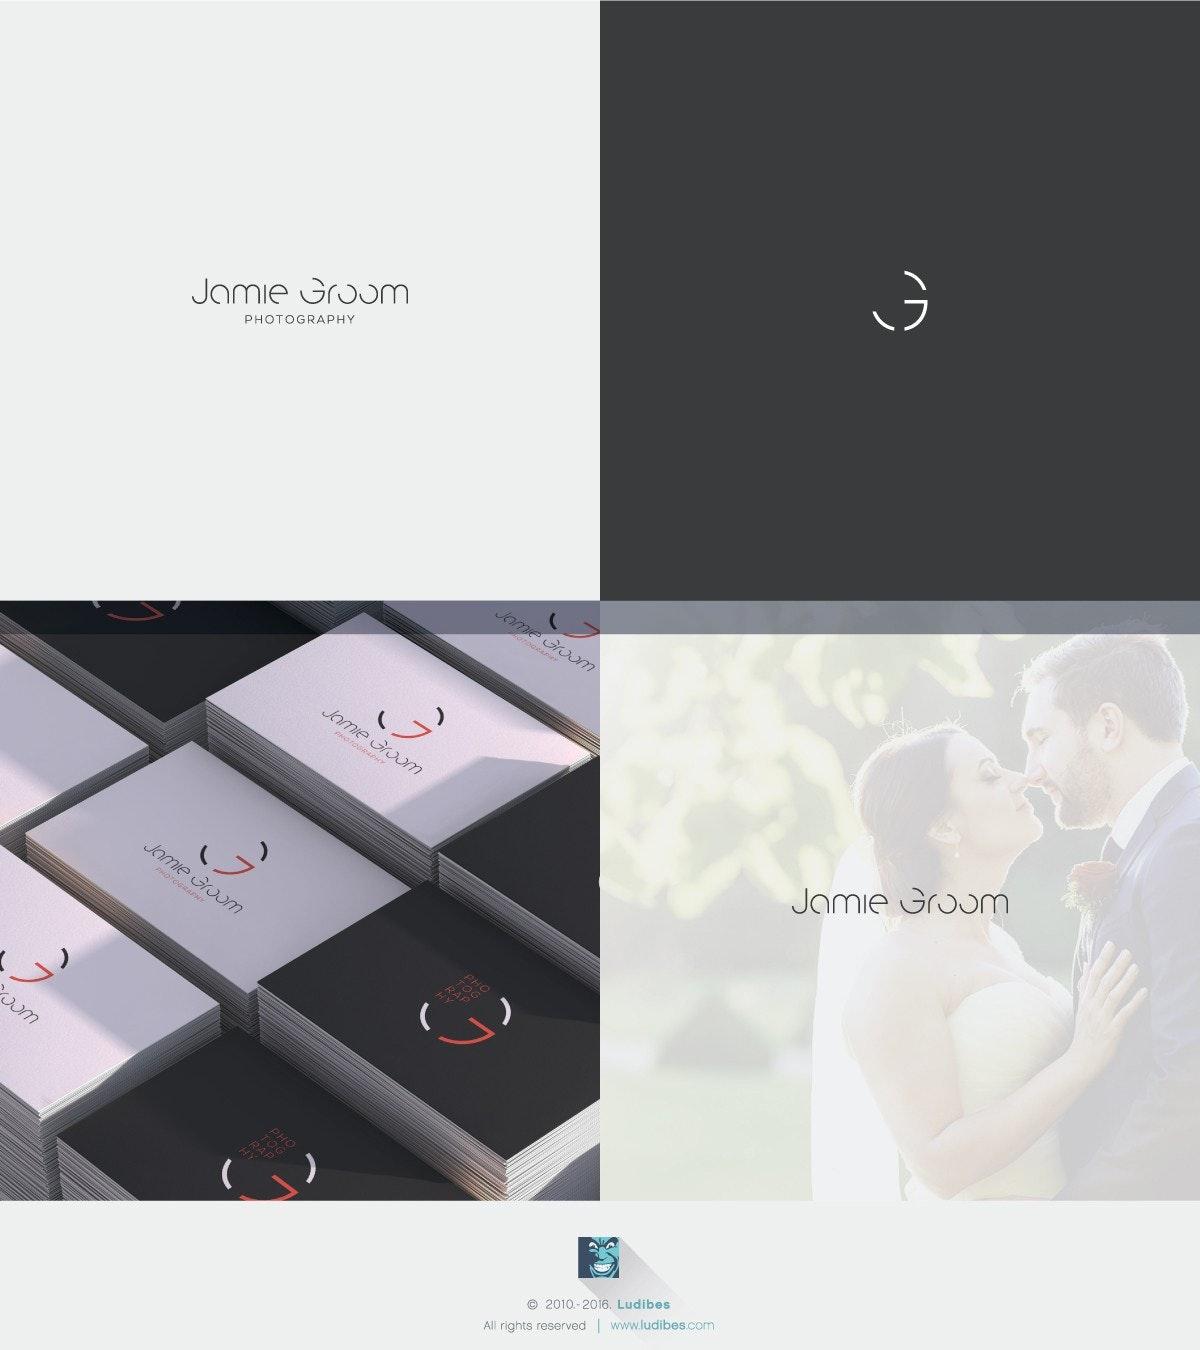 Jamie Groom logo